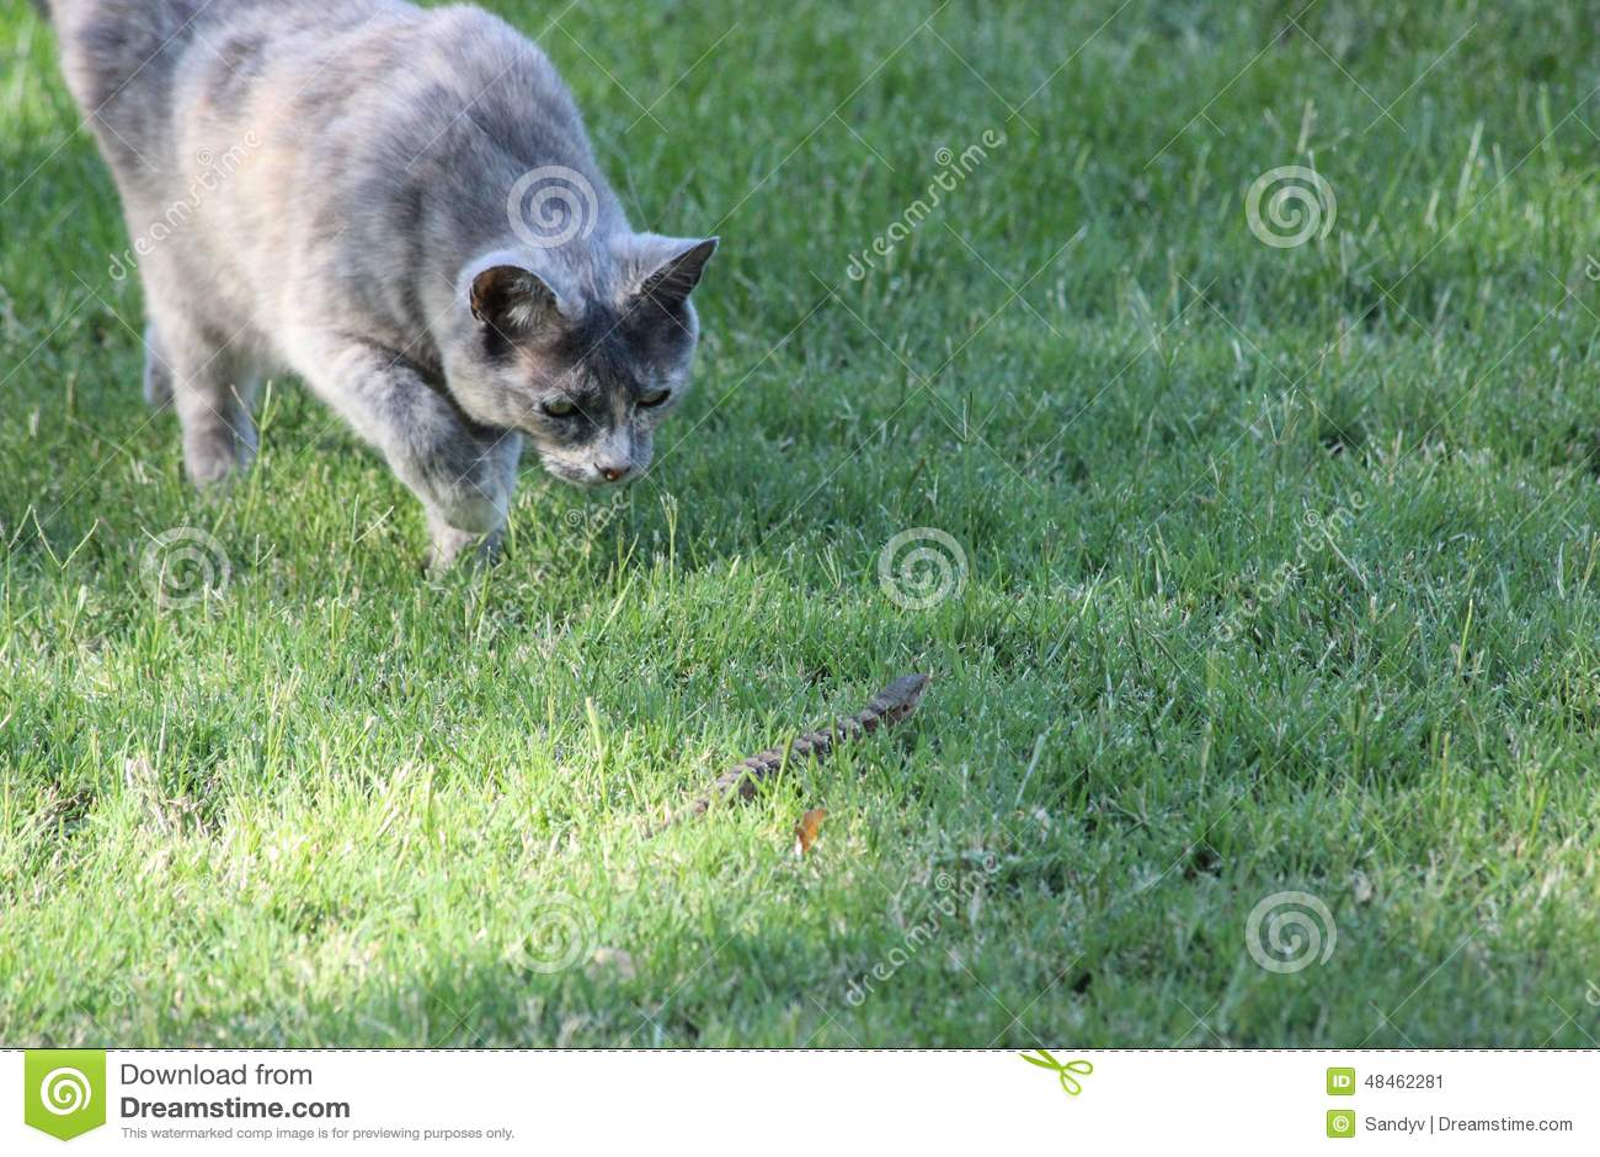 stalking cat stock image image of stalking green housecat